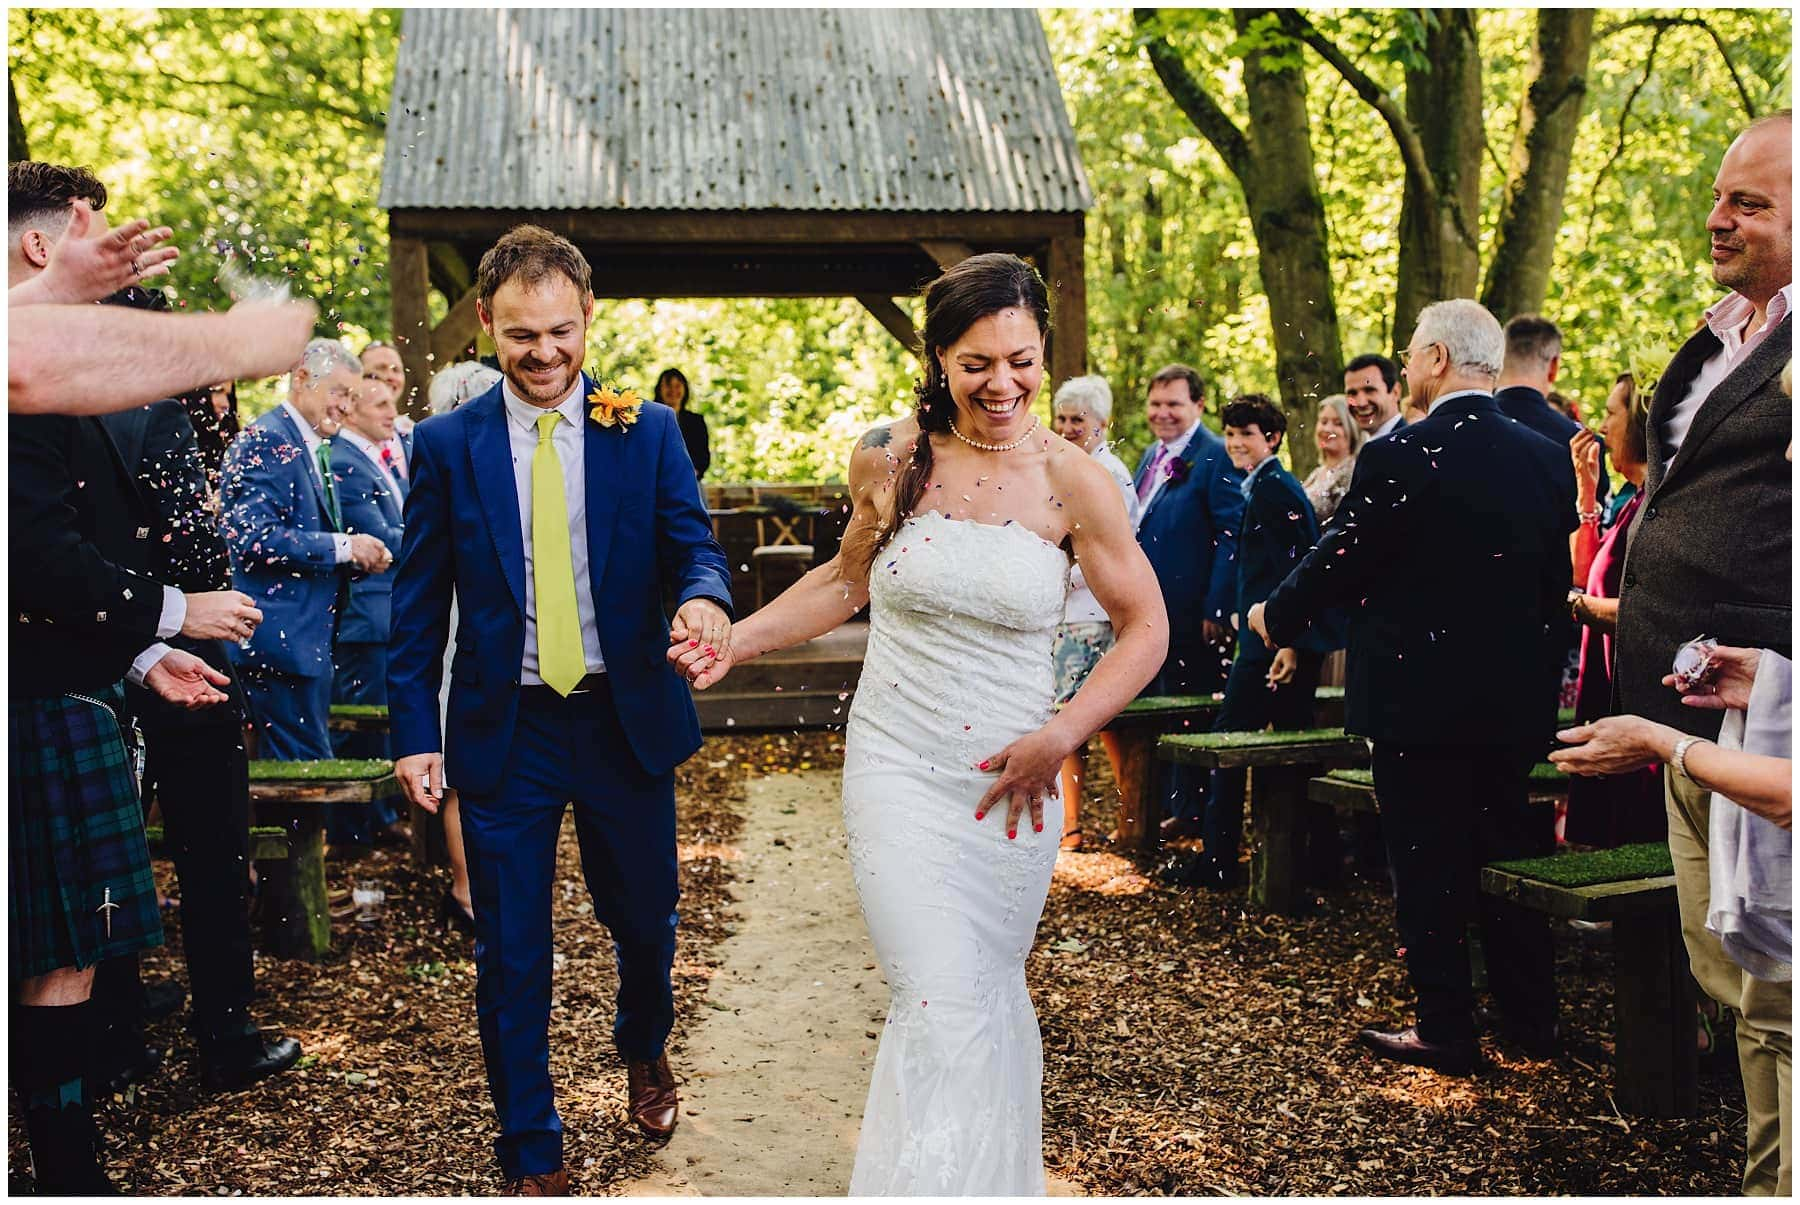 Hothorp Hall Woodlands Wedding Photographer 28